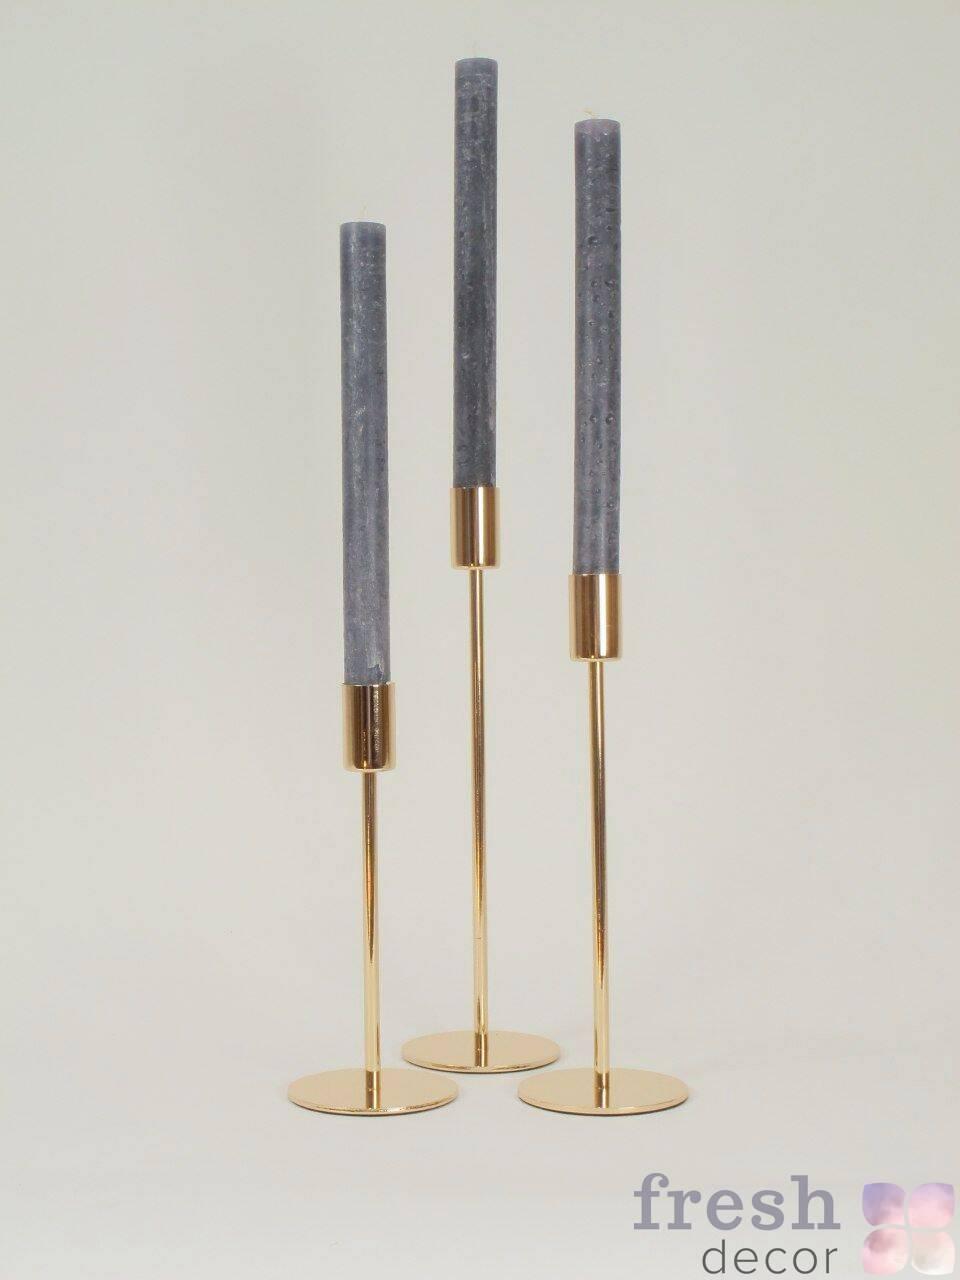 dizajnerskie zolotye podsvechniki dlya odnoj tonkoj svechi na dlinnoj zolotoj nozhke stokgolm